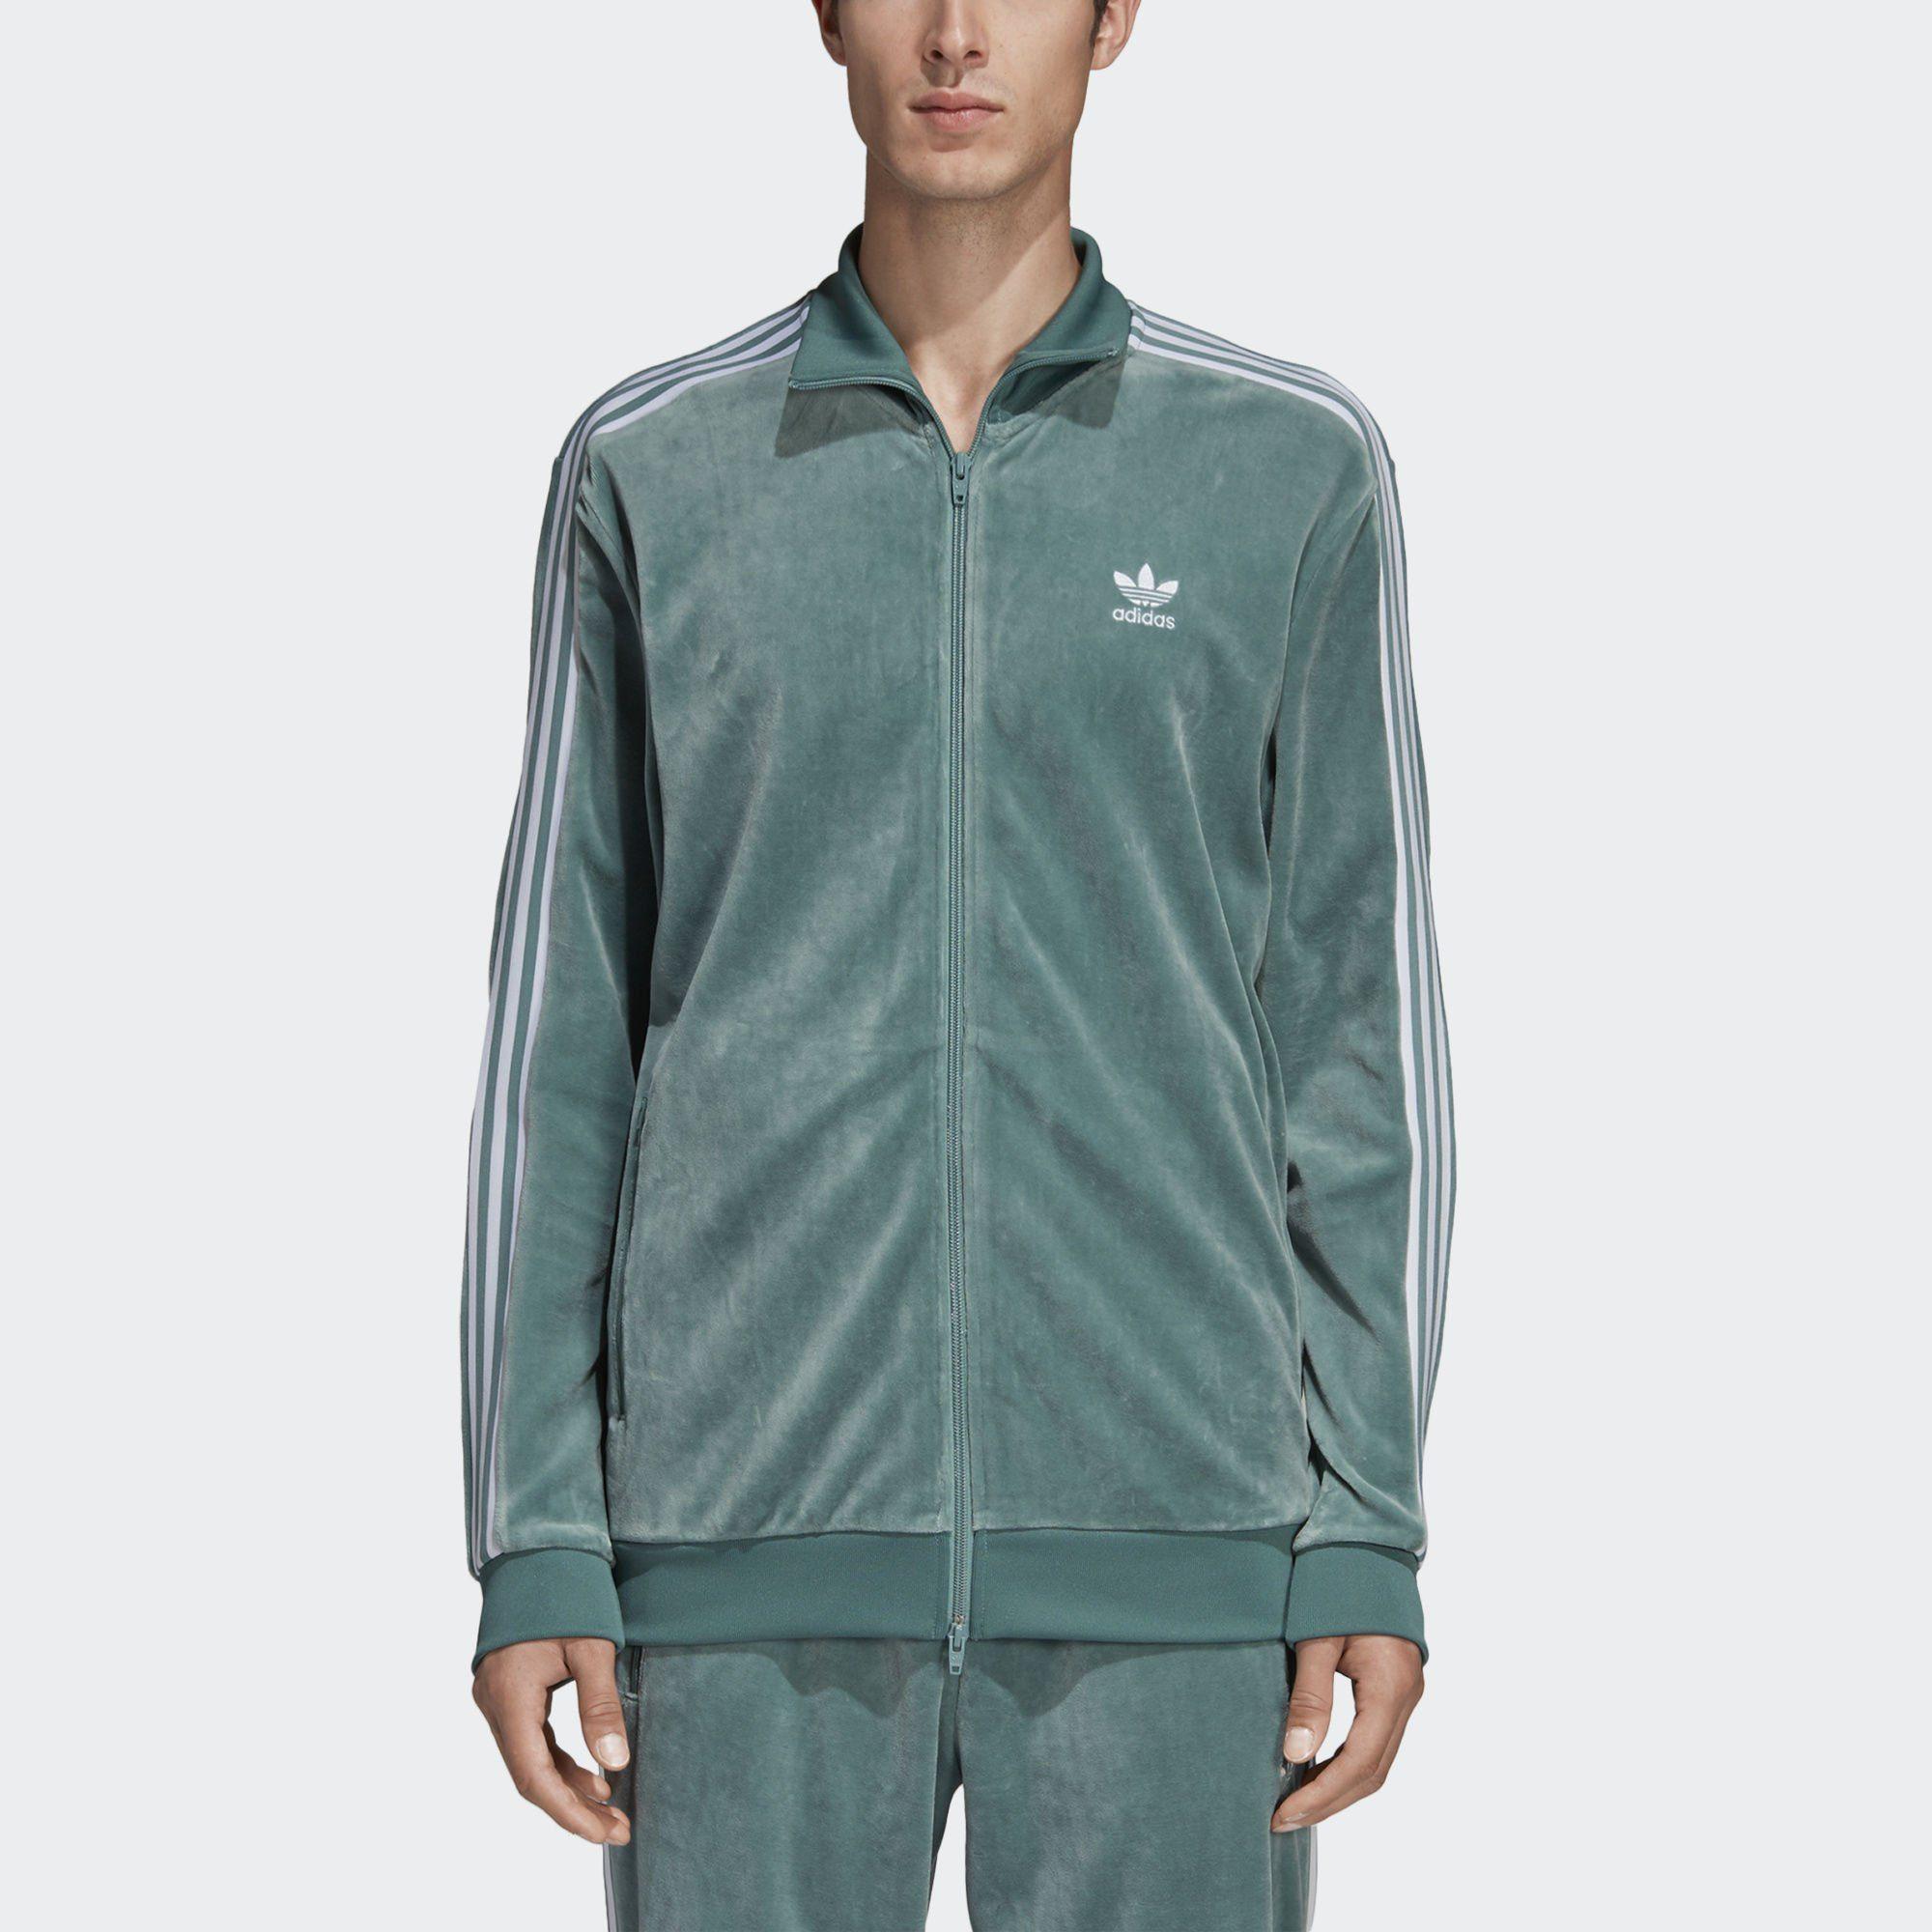 adidas Originals Sweatjacke »BB Originals Jacke« adicolor online kaufen   OTTO